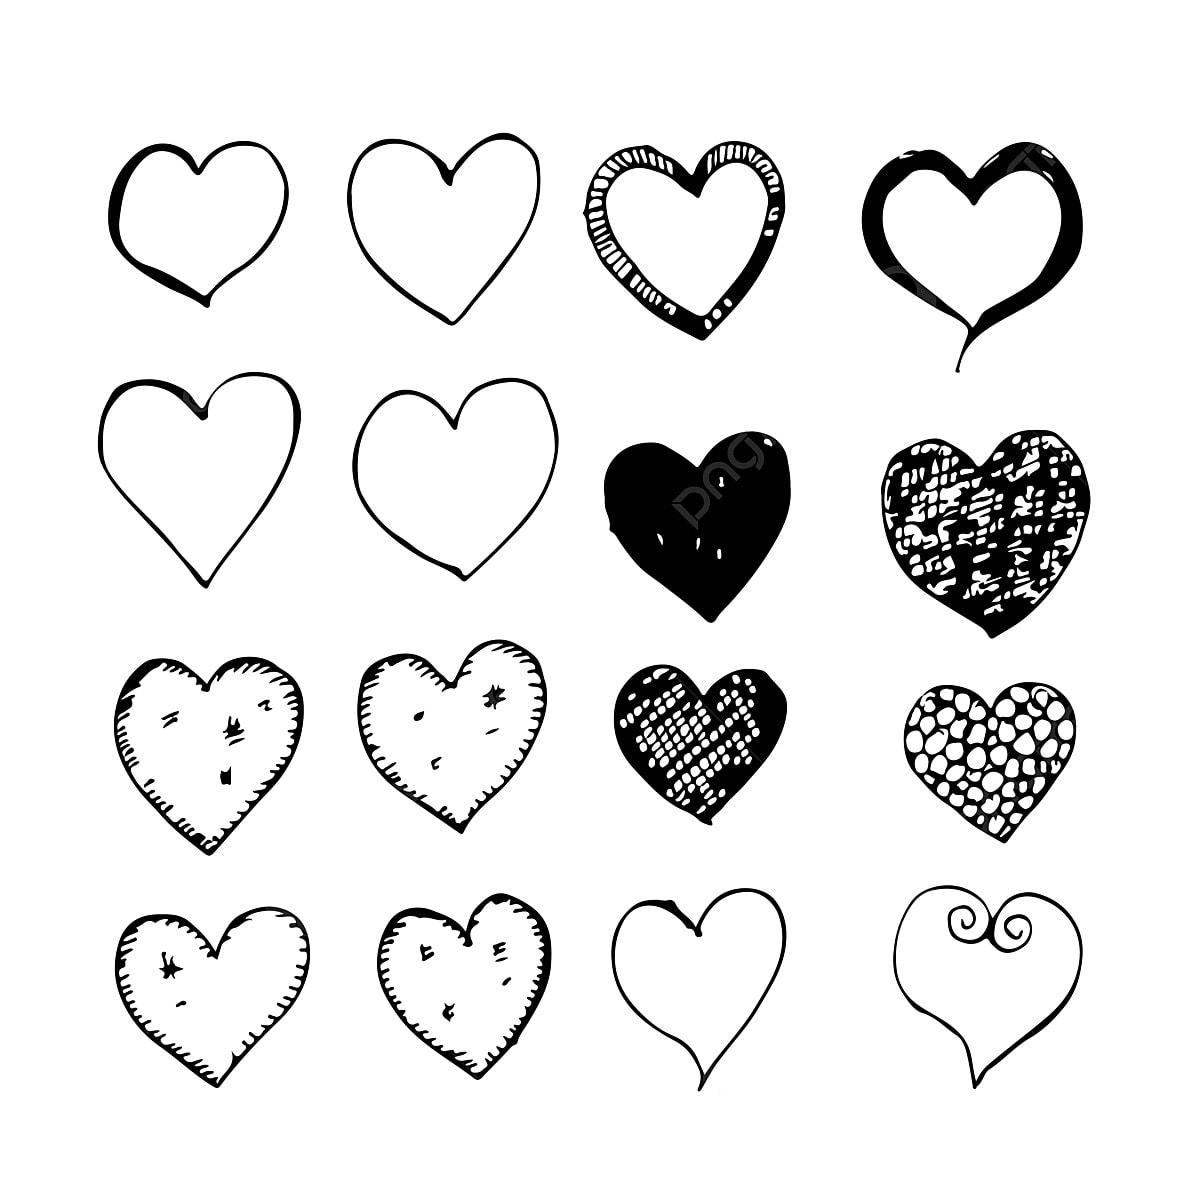 مزخرف القلب رسم Clipart K17387223 Fotosearch